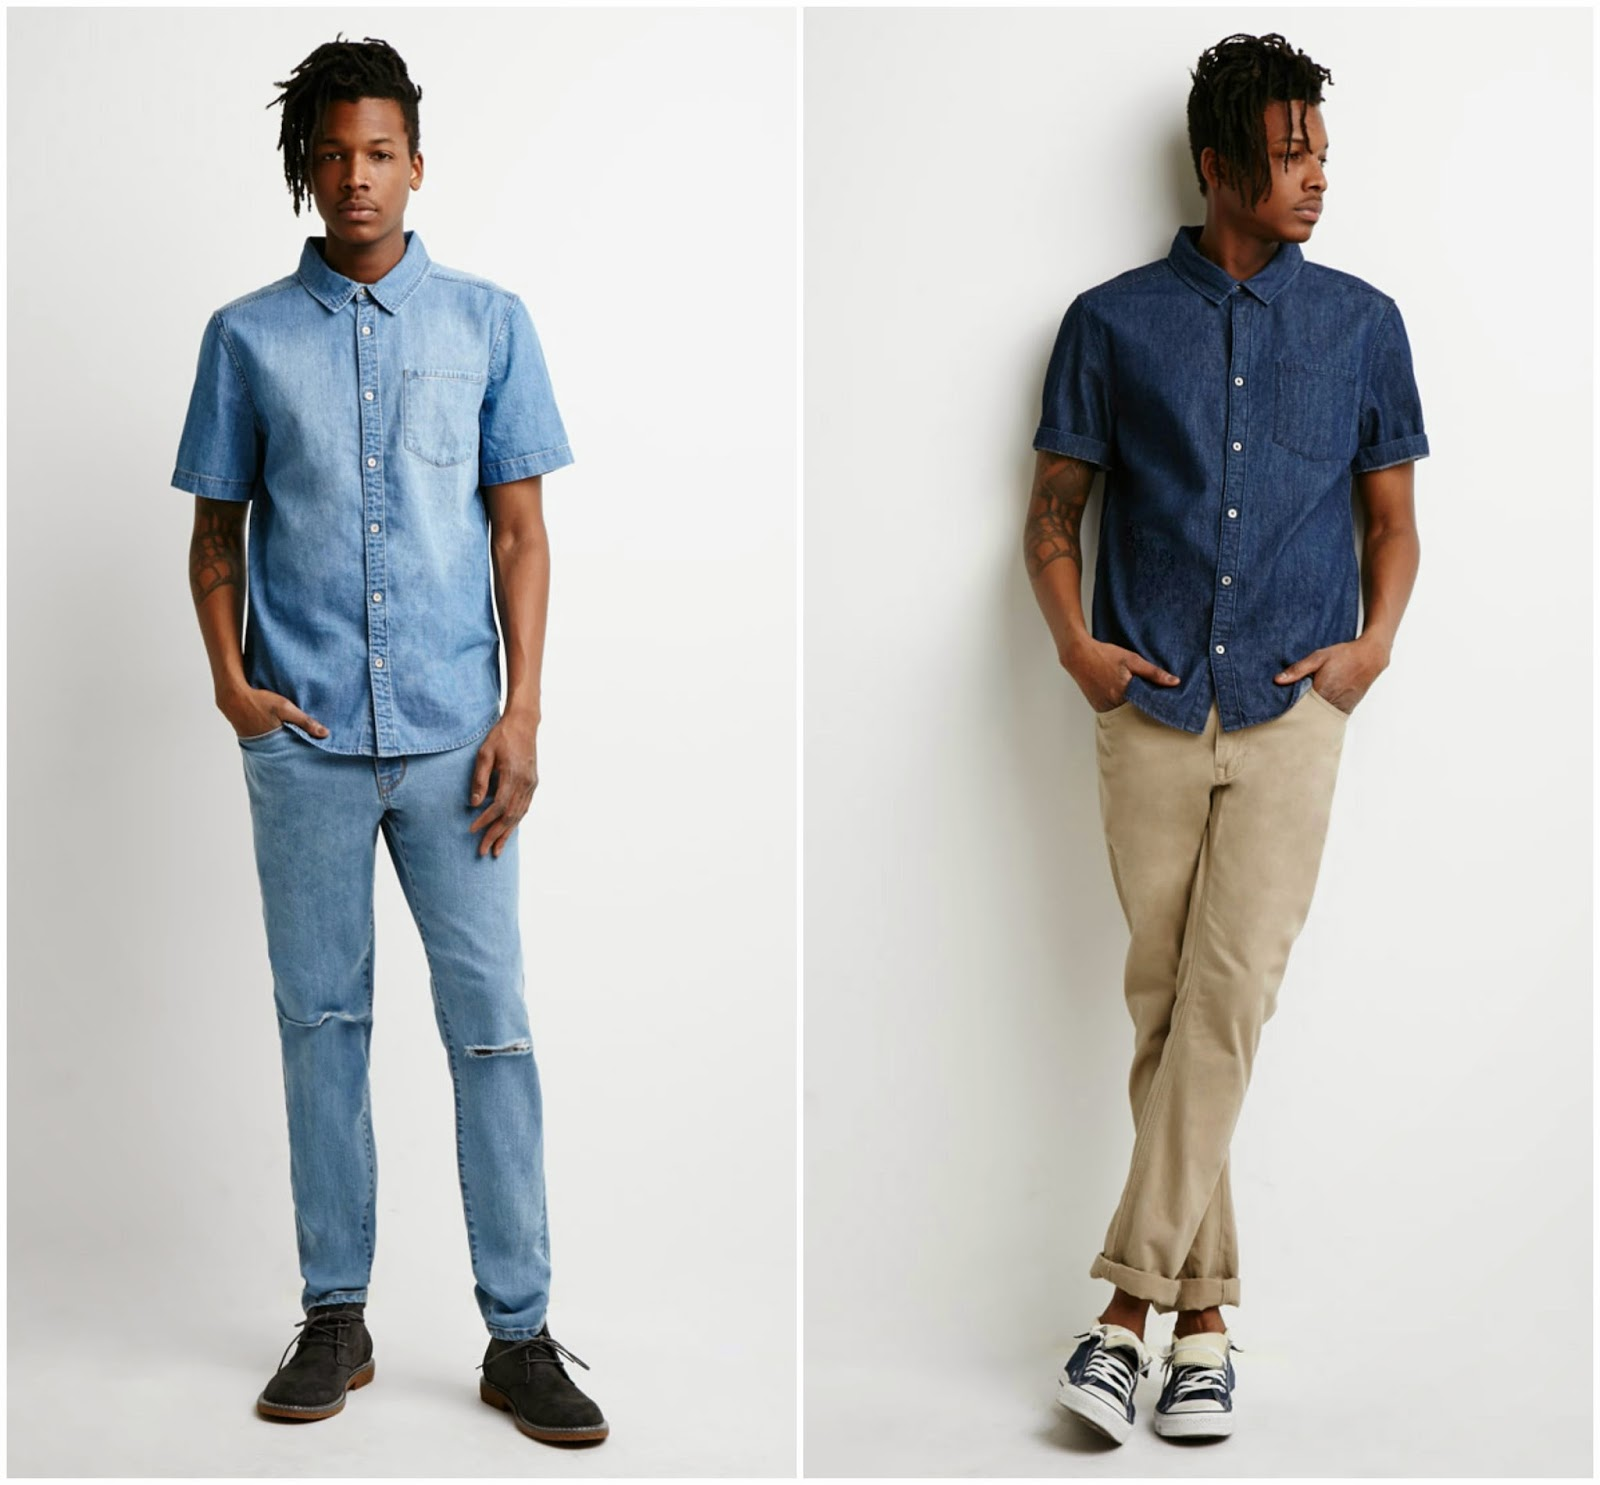 Combinar pantalon mezclilla hombre for Programa para combinar colores